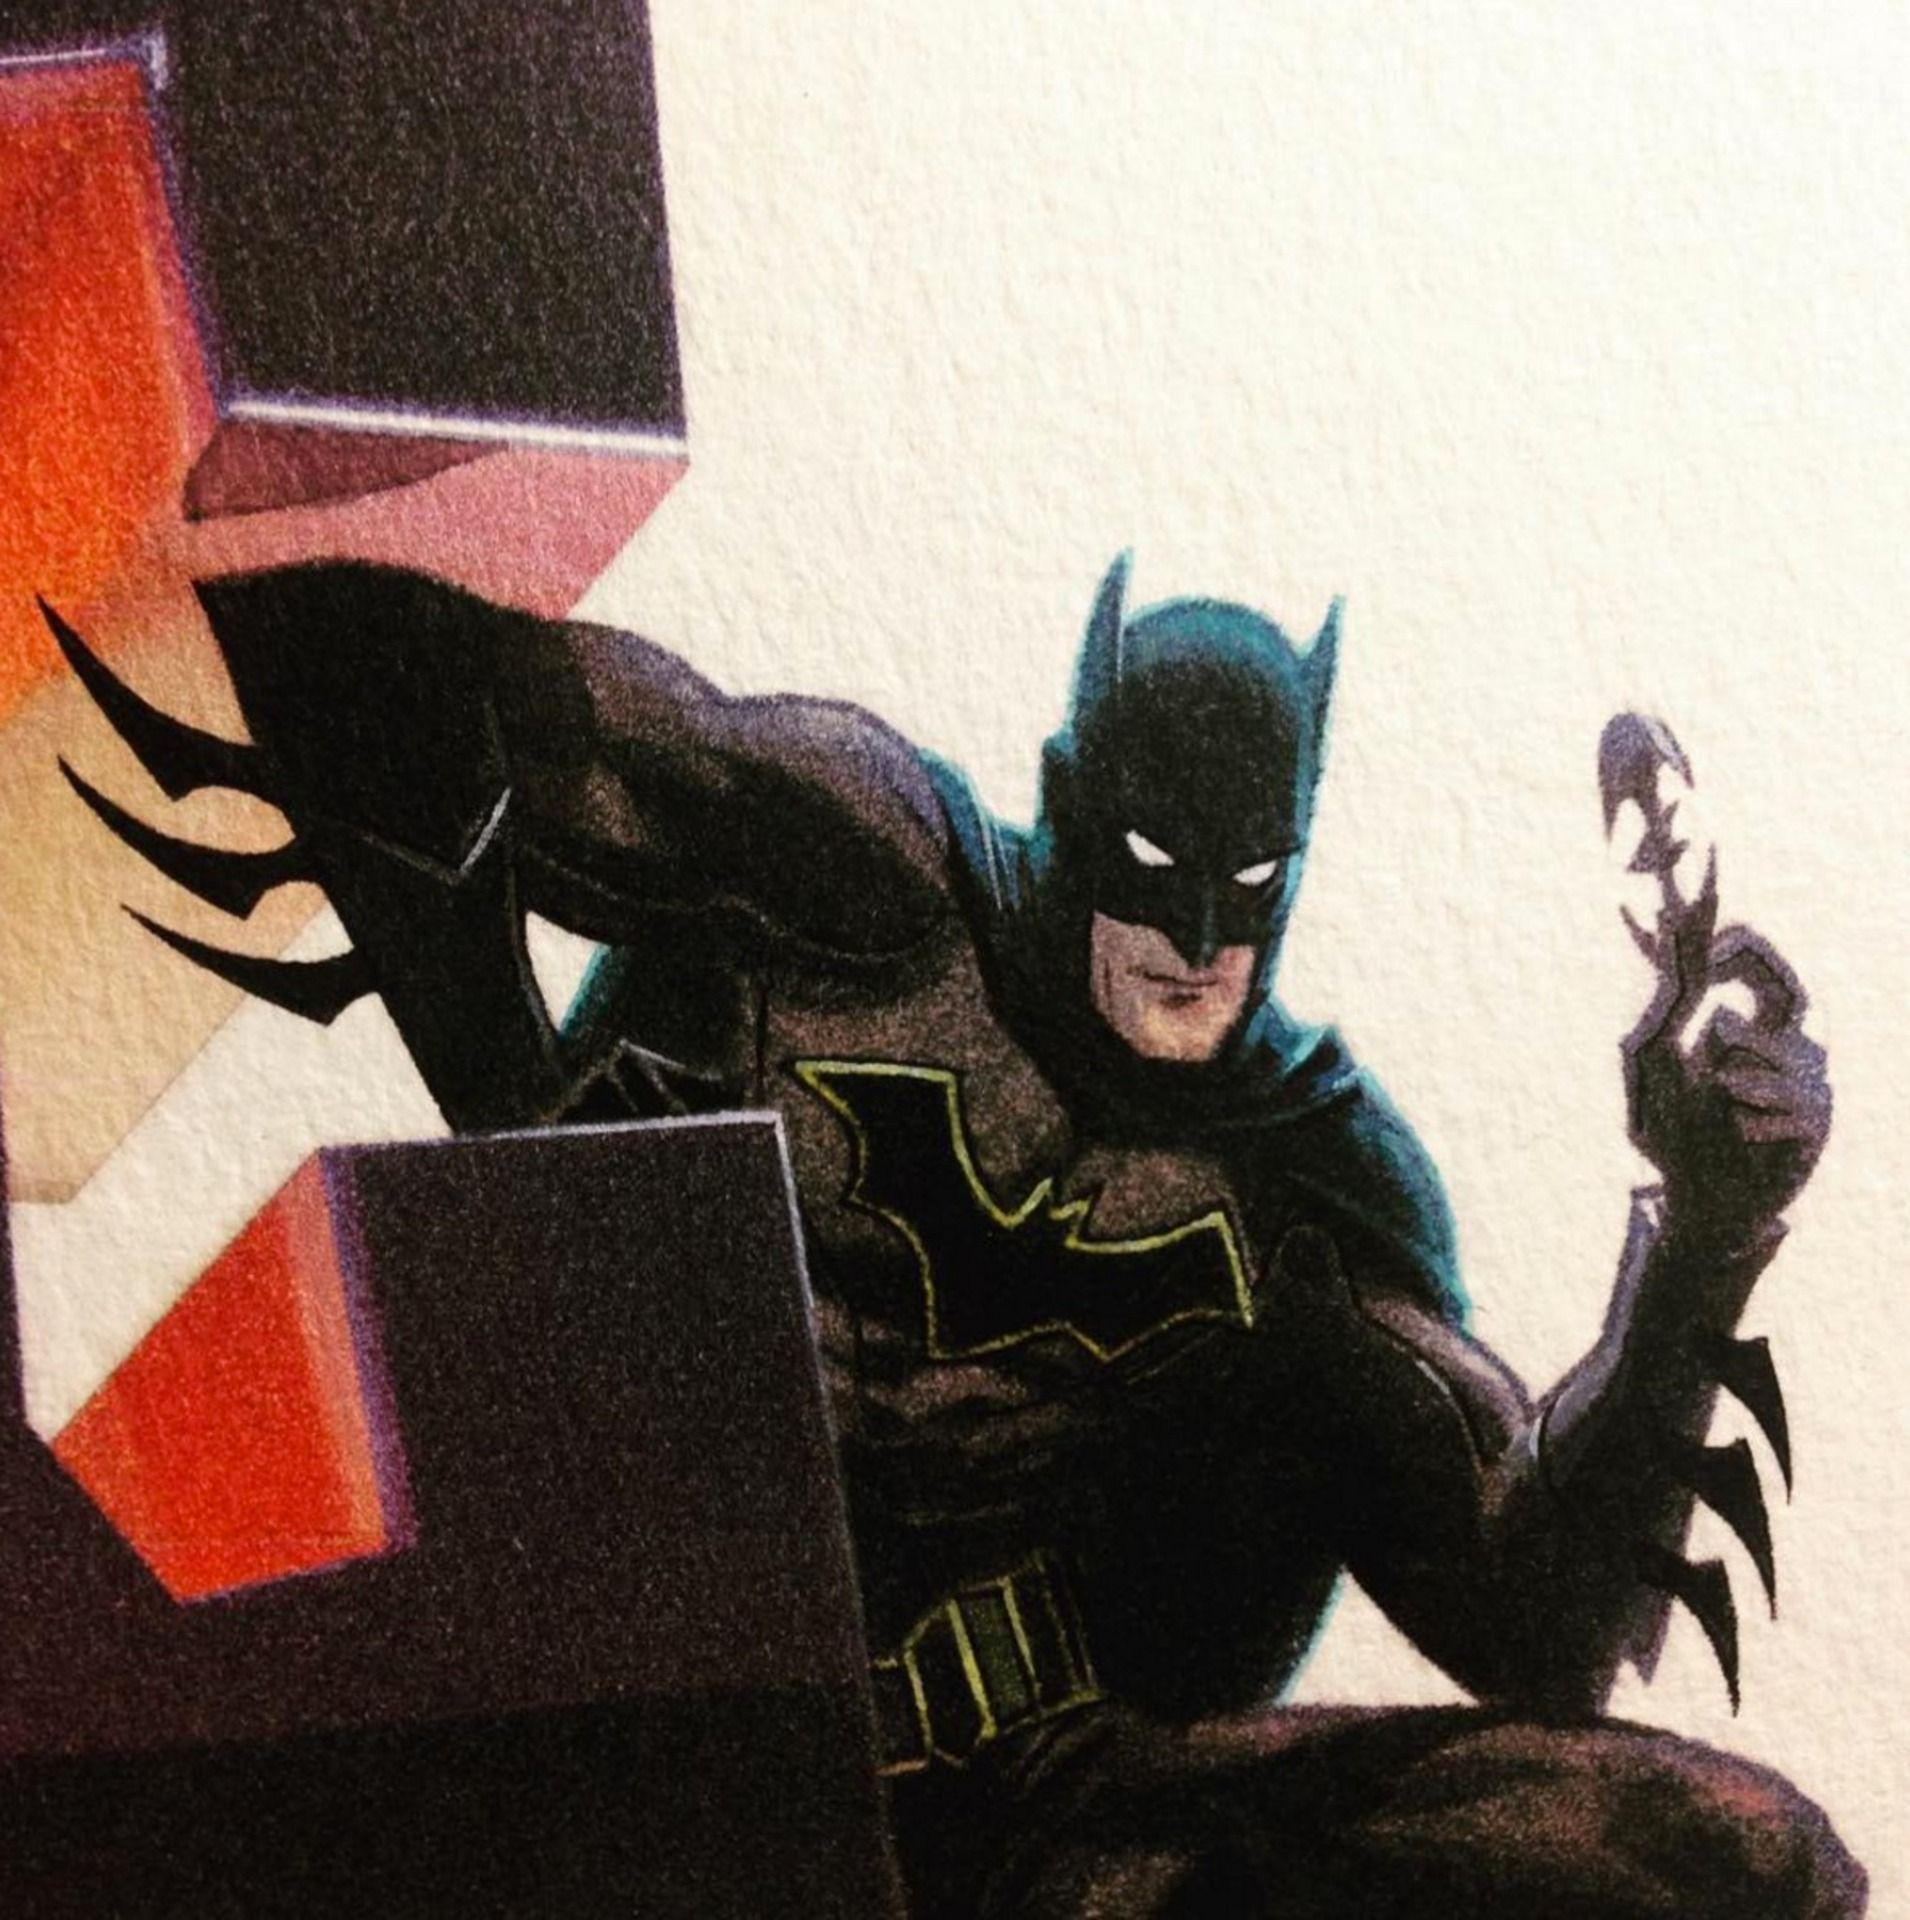 Awesome Art Picks: Wonder Woman, Stranger Things, Mr. Freeze, and More - Comic Vine